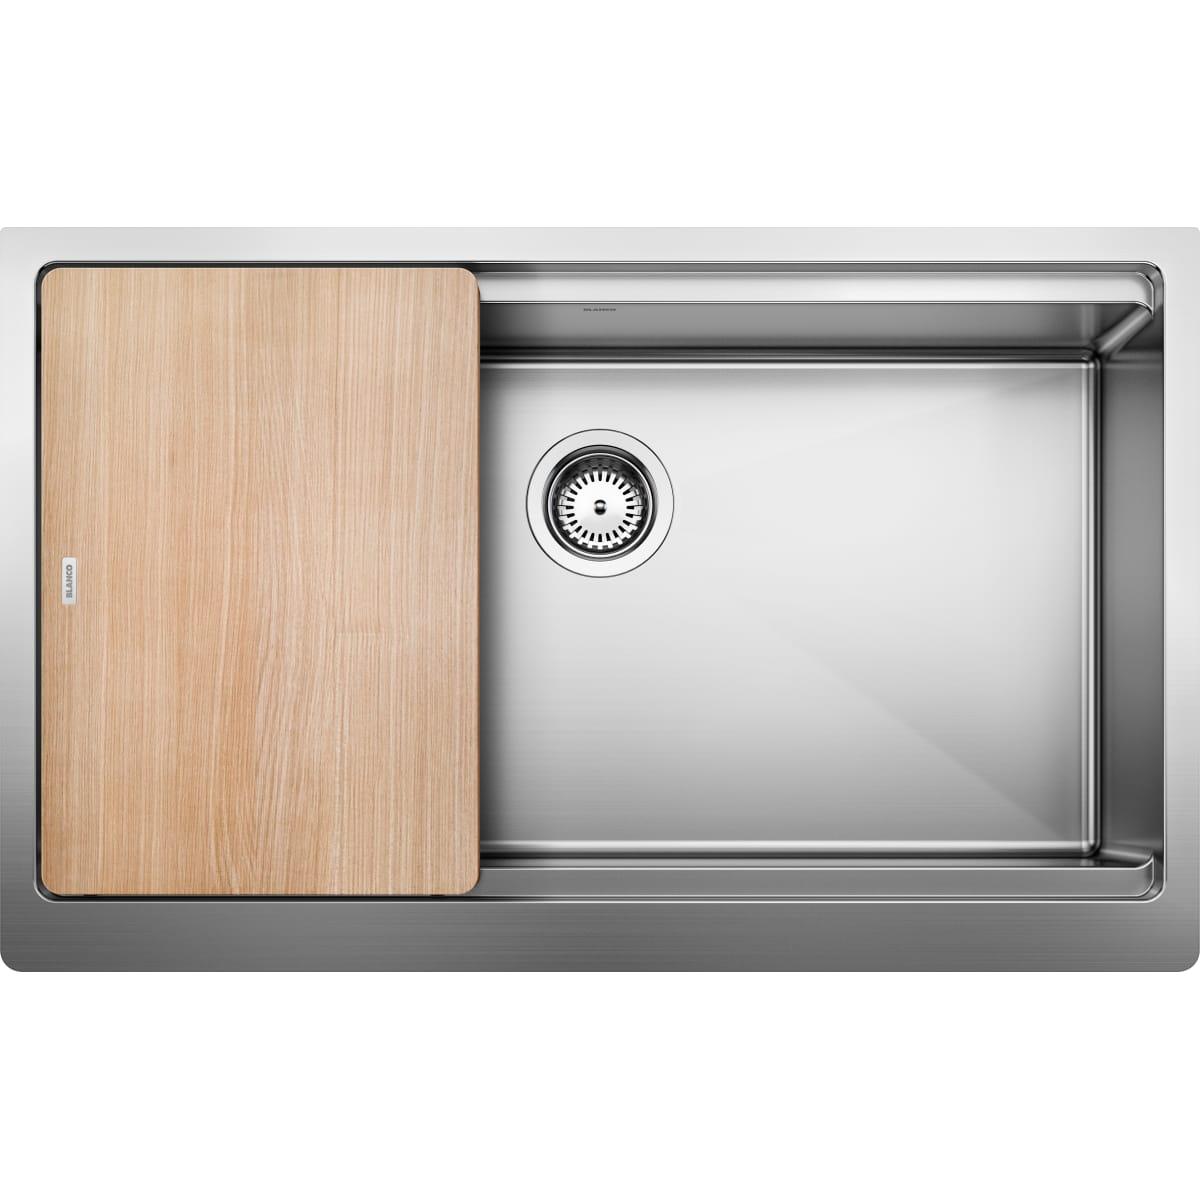 "Blanco Quatrus 33"" Farmhouse Single Basin Stainless Steel Kitchen Sink"